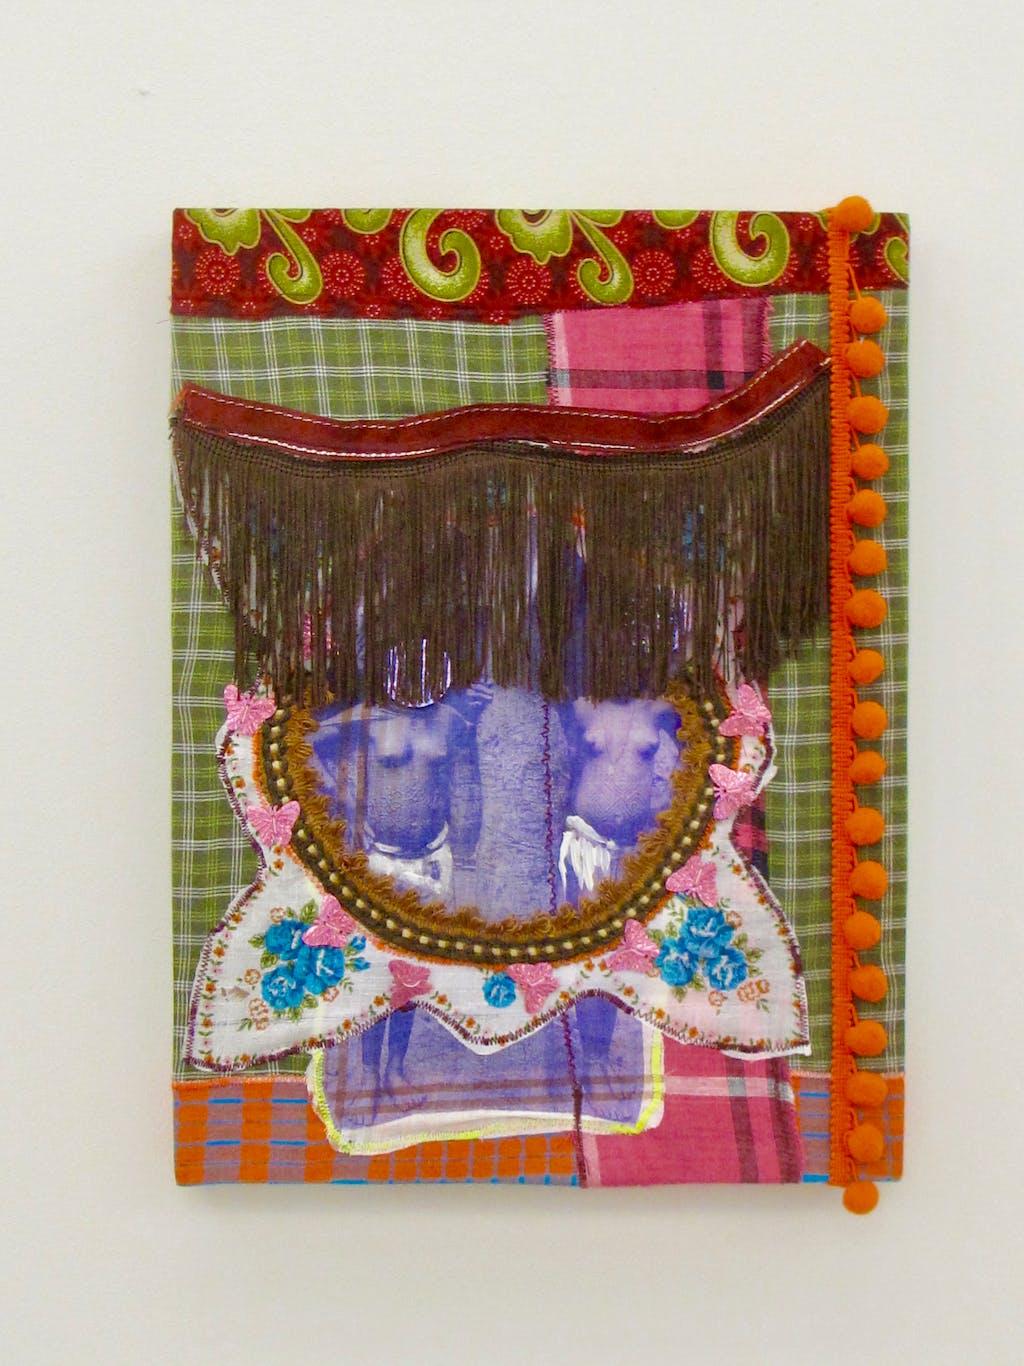 Patricia Kaersenhout Distant Bodies, 2011 Collage of textiles, photographic print on handkerchief Pangi Fabric, glitters, embroidery, stitching, paint 40 x 30 cm, unique (PK2011-1) - © Paris Internationale